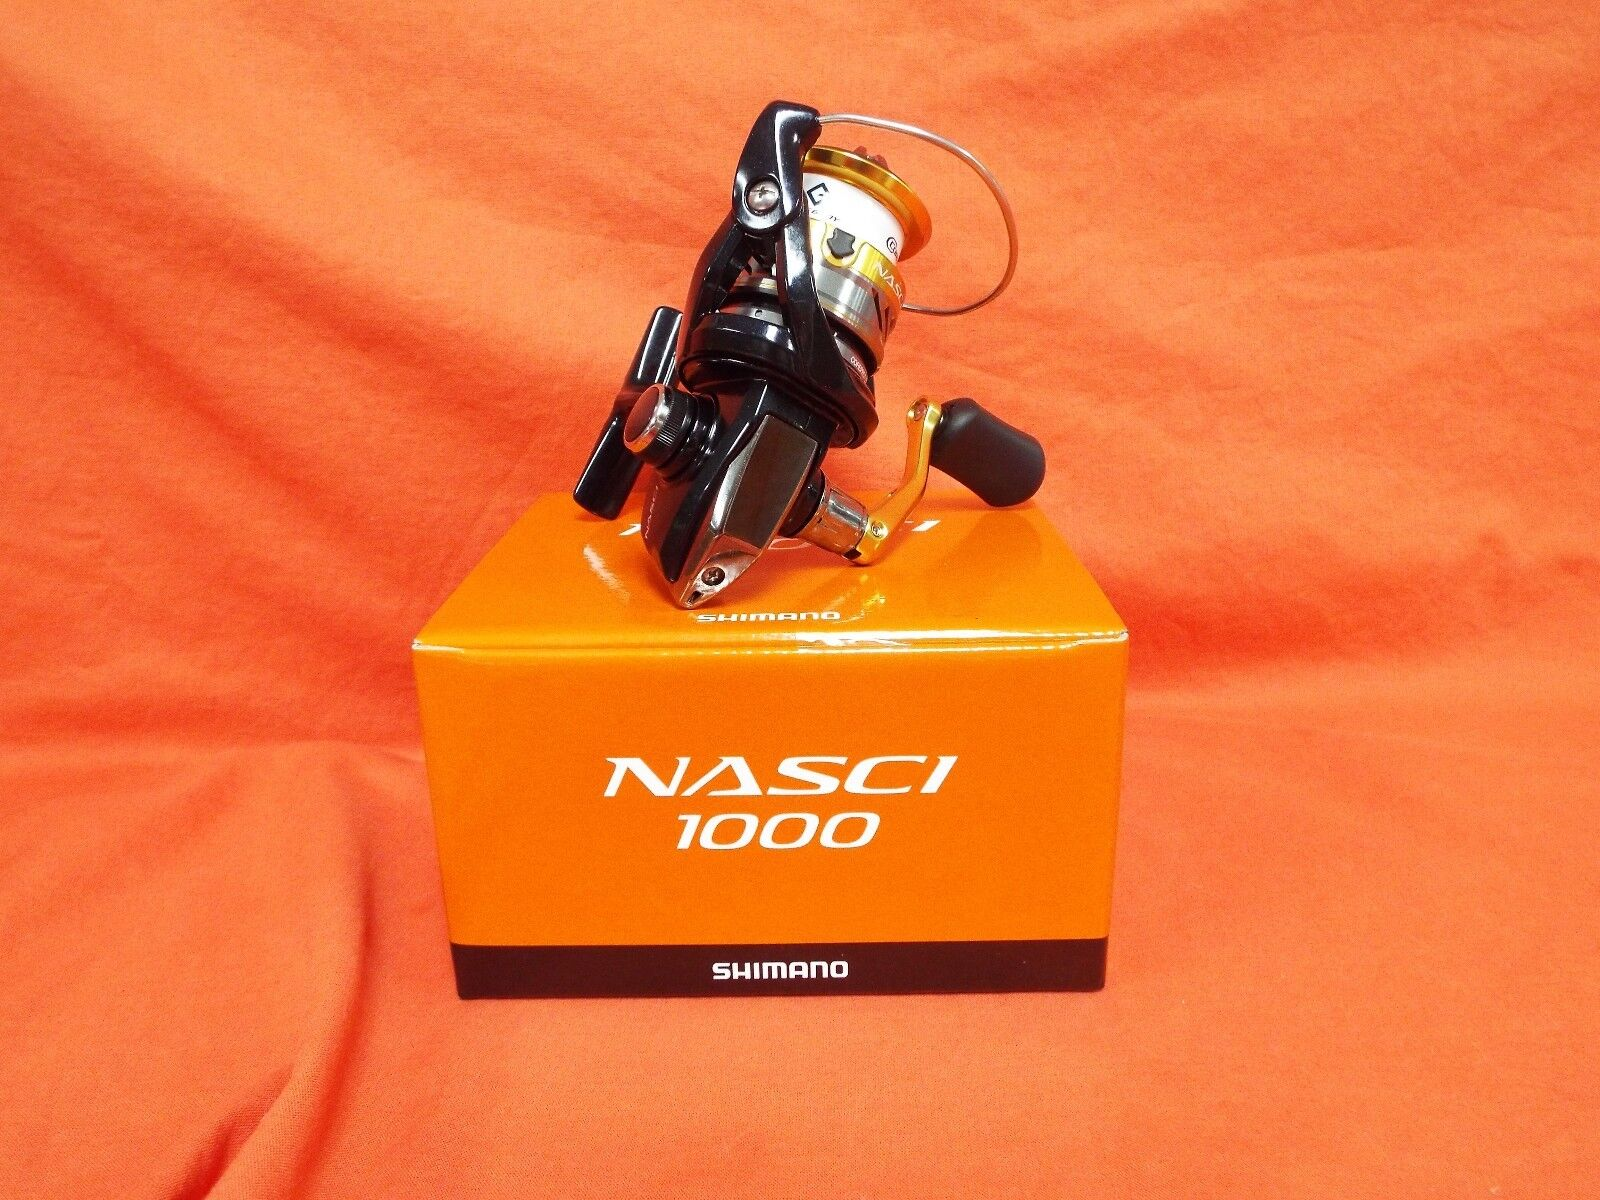 SHIMANO Nasci 1000 Spinning  Reel 5.0 1 Gear Ratio  NAS-1000FB  low-key luxury connotation